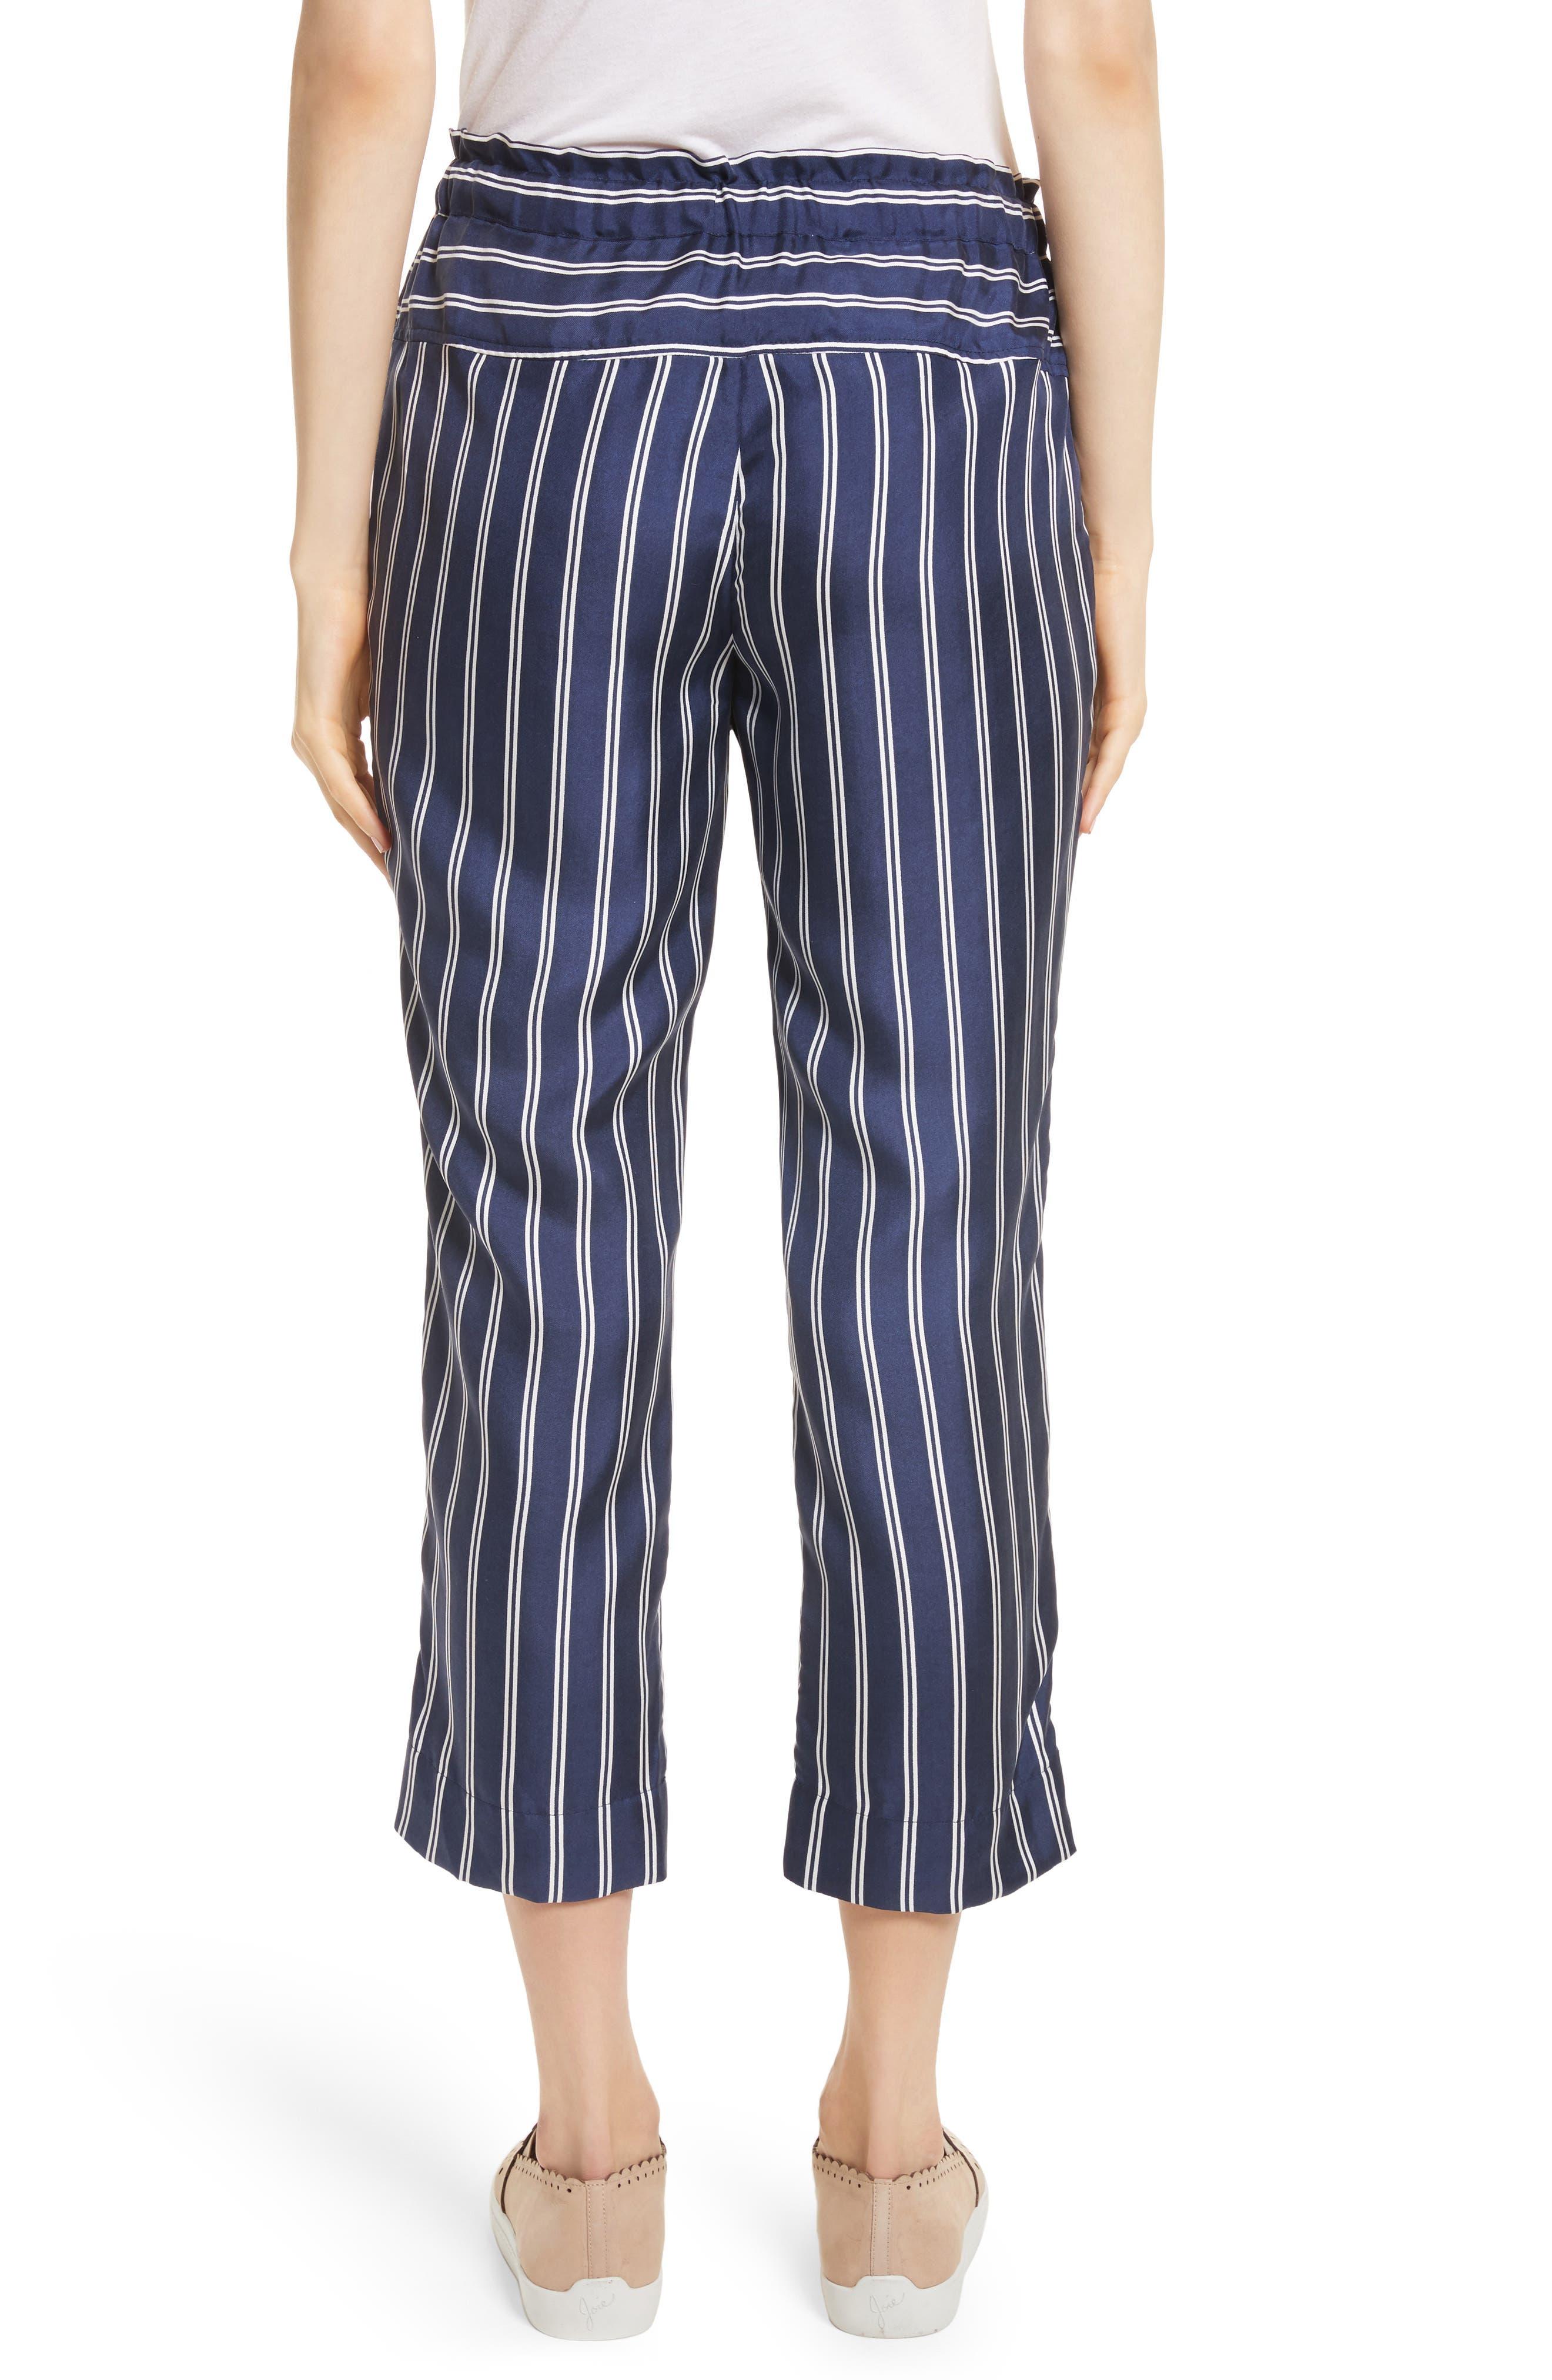 Addiena Stripe Silk Pants,                             Alternate thumbnail 2, color,                             Dark Navy